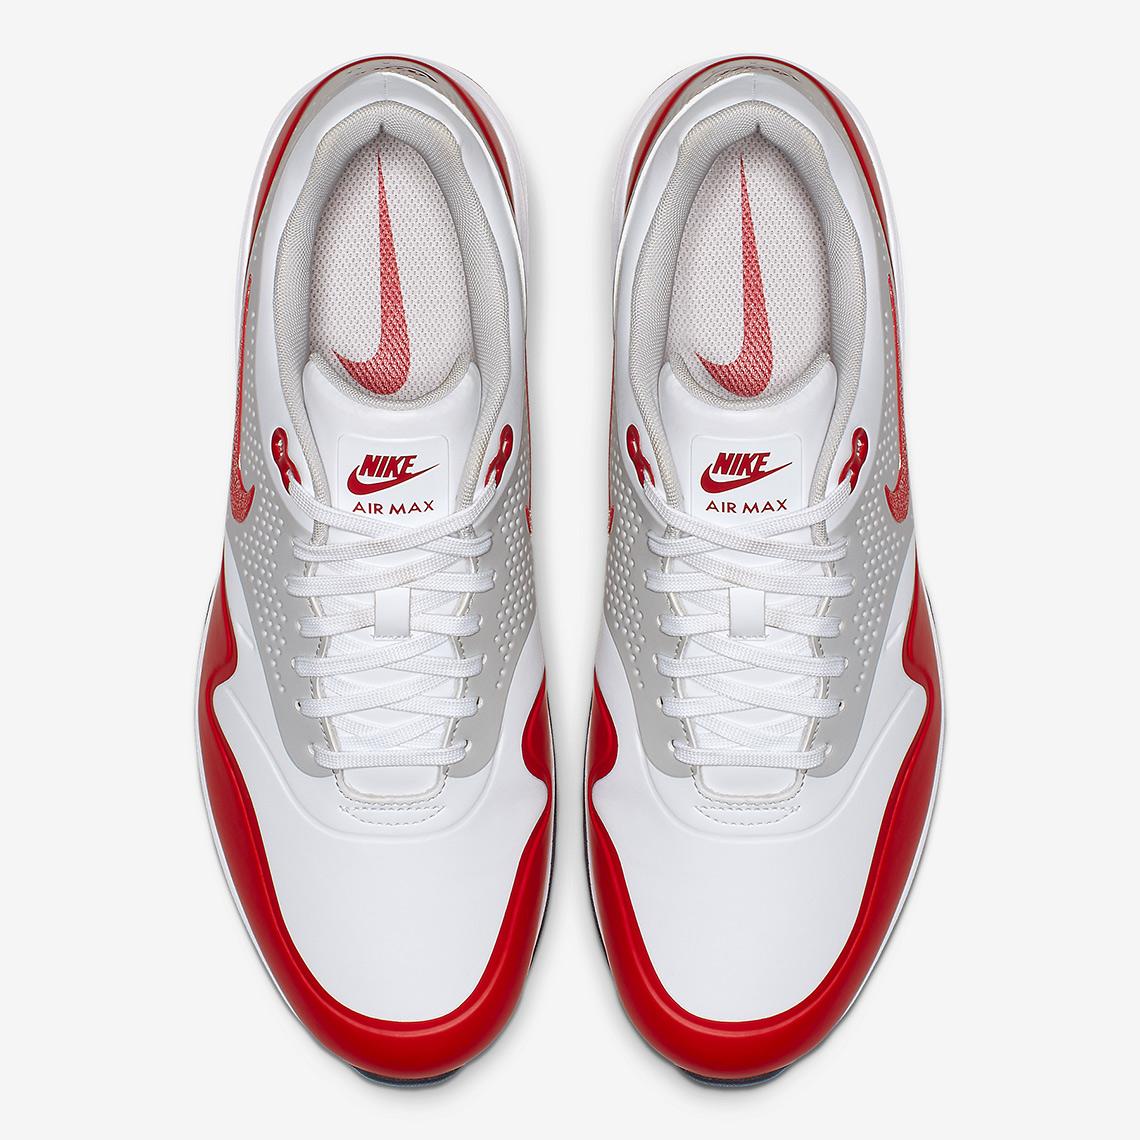 Nike Air Max 1 Golf Shoe Where To Buy Sneakernews Com